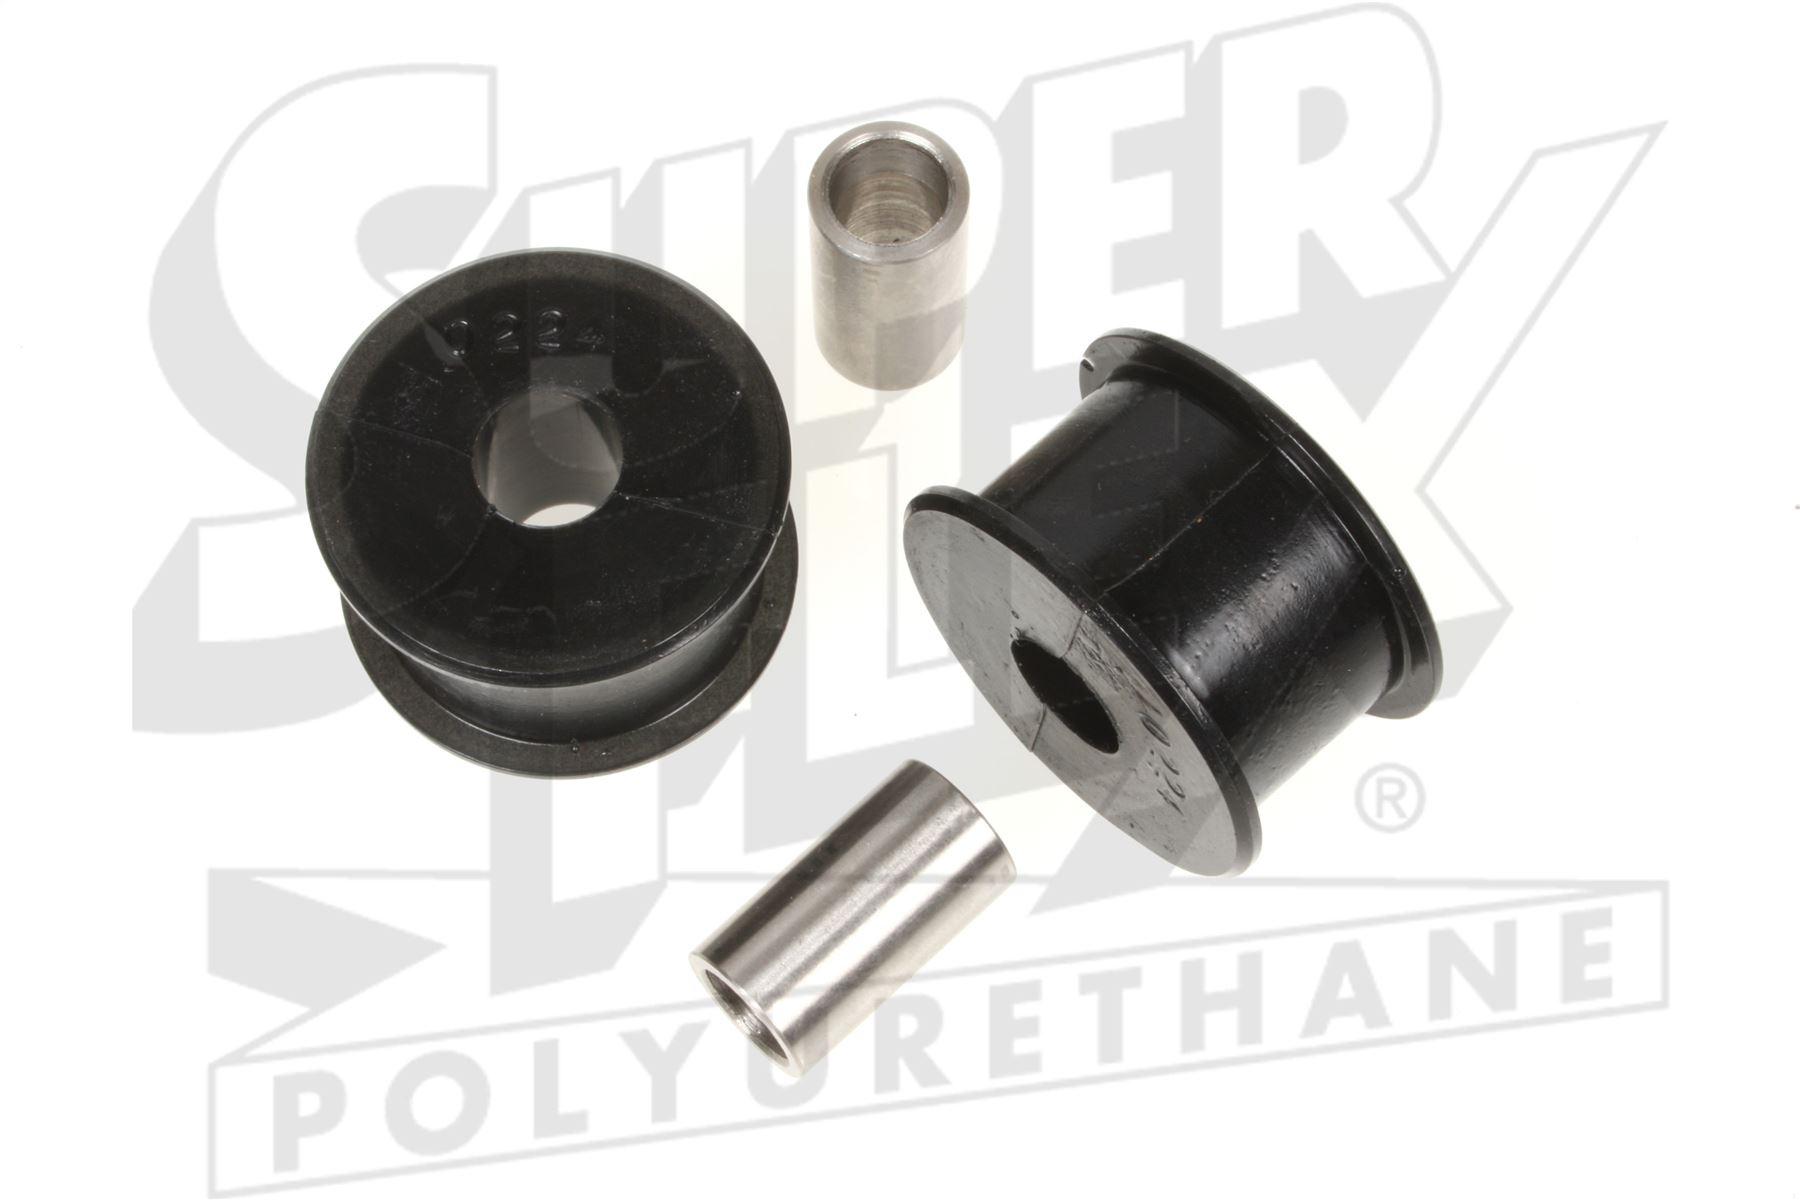 Superflex arrière anti roll bar bush kit pour honda civic eg eh ej 1991-1995